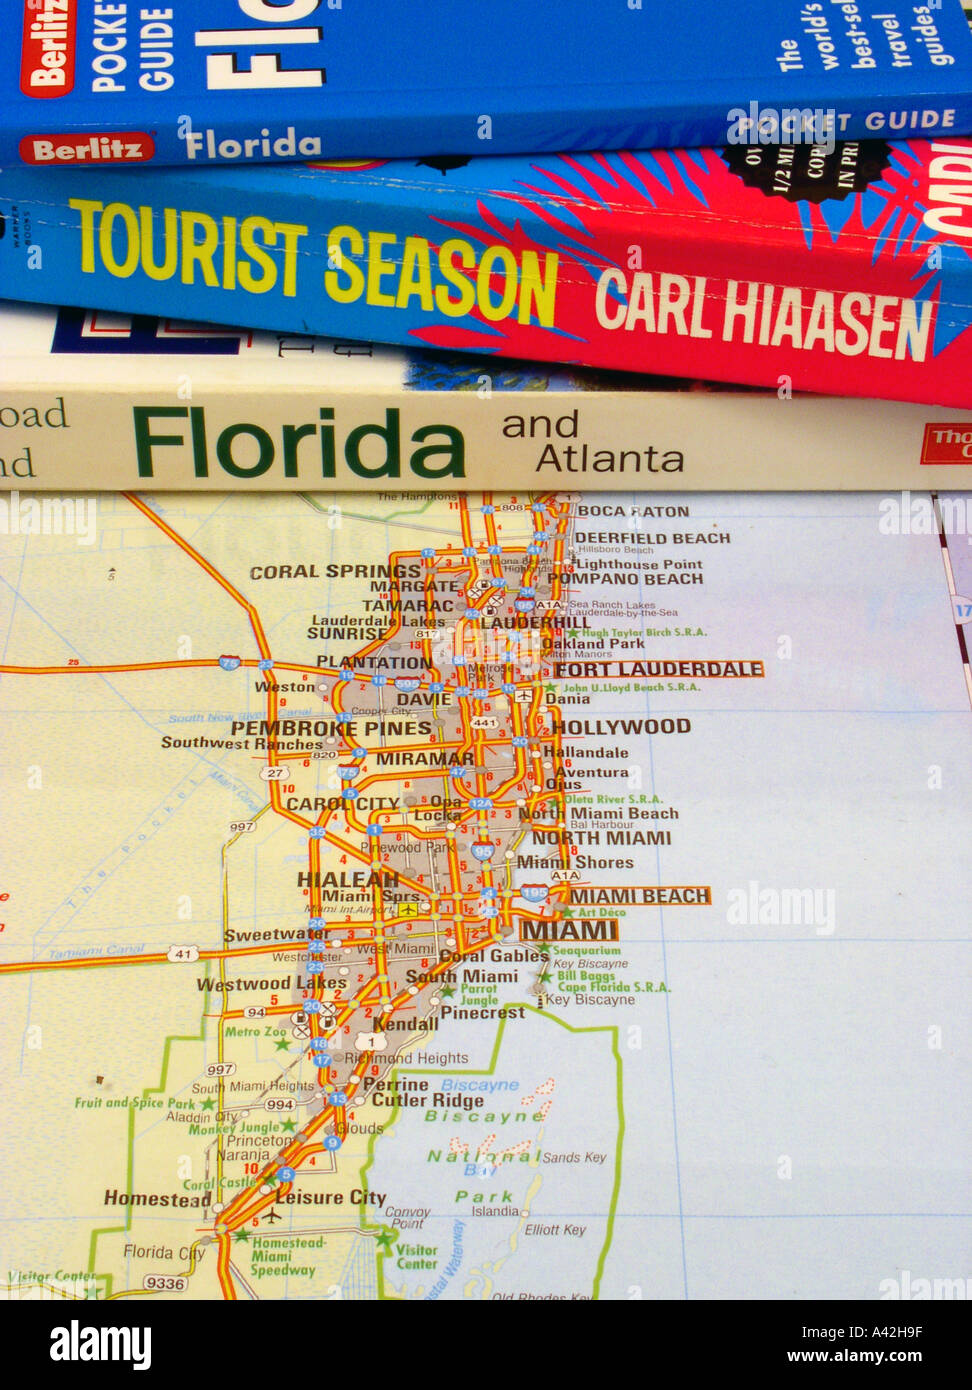 Florida Guide Guidebooks Carl Hiaasen Novel Tourist Season Map Of – Florida Tourist Map